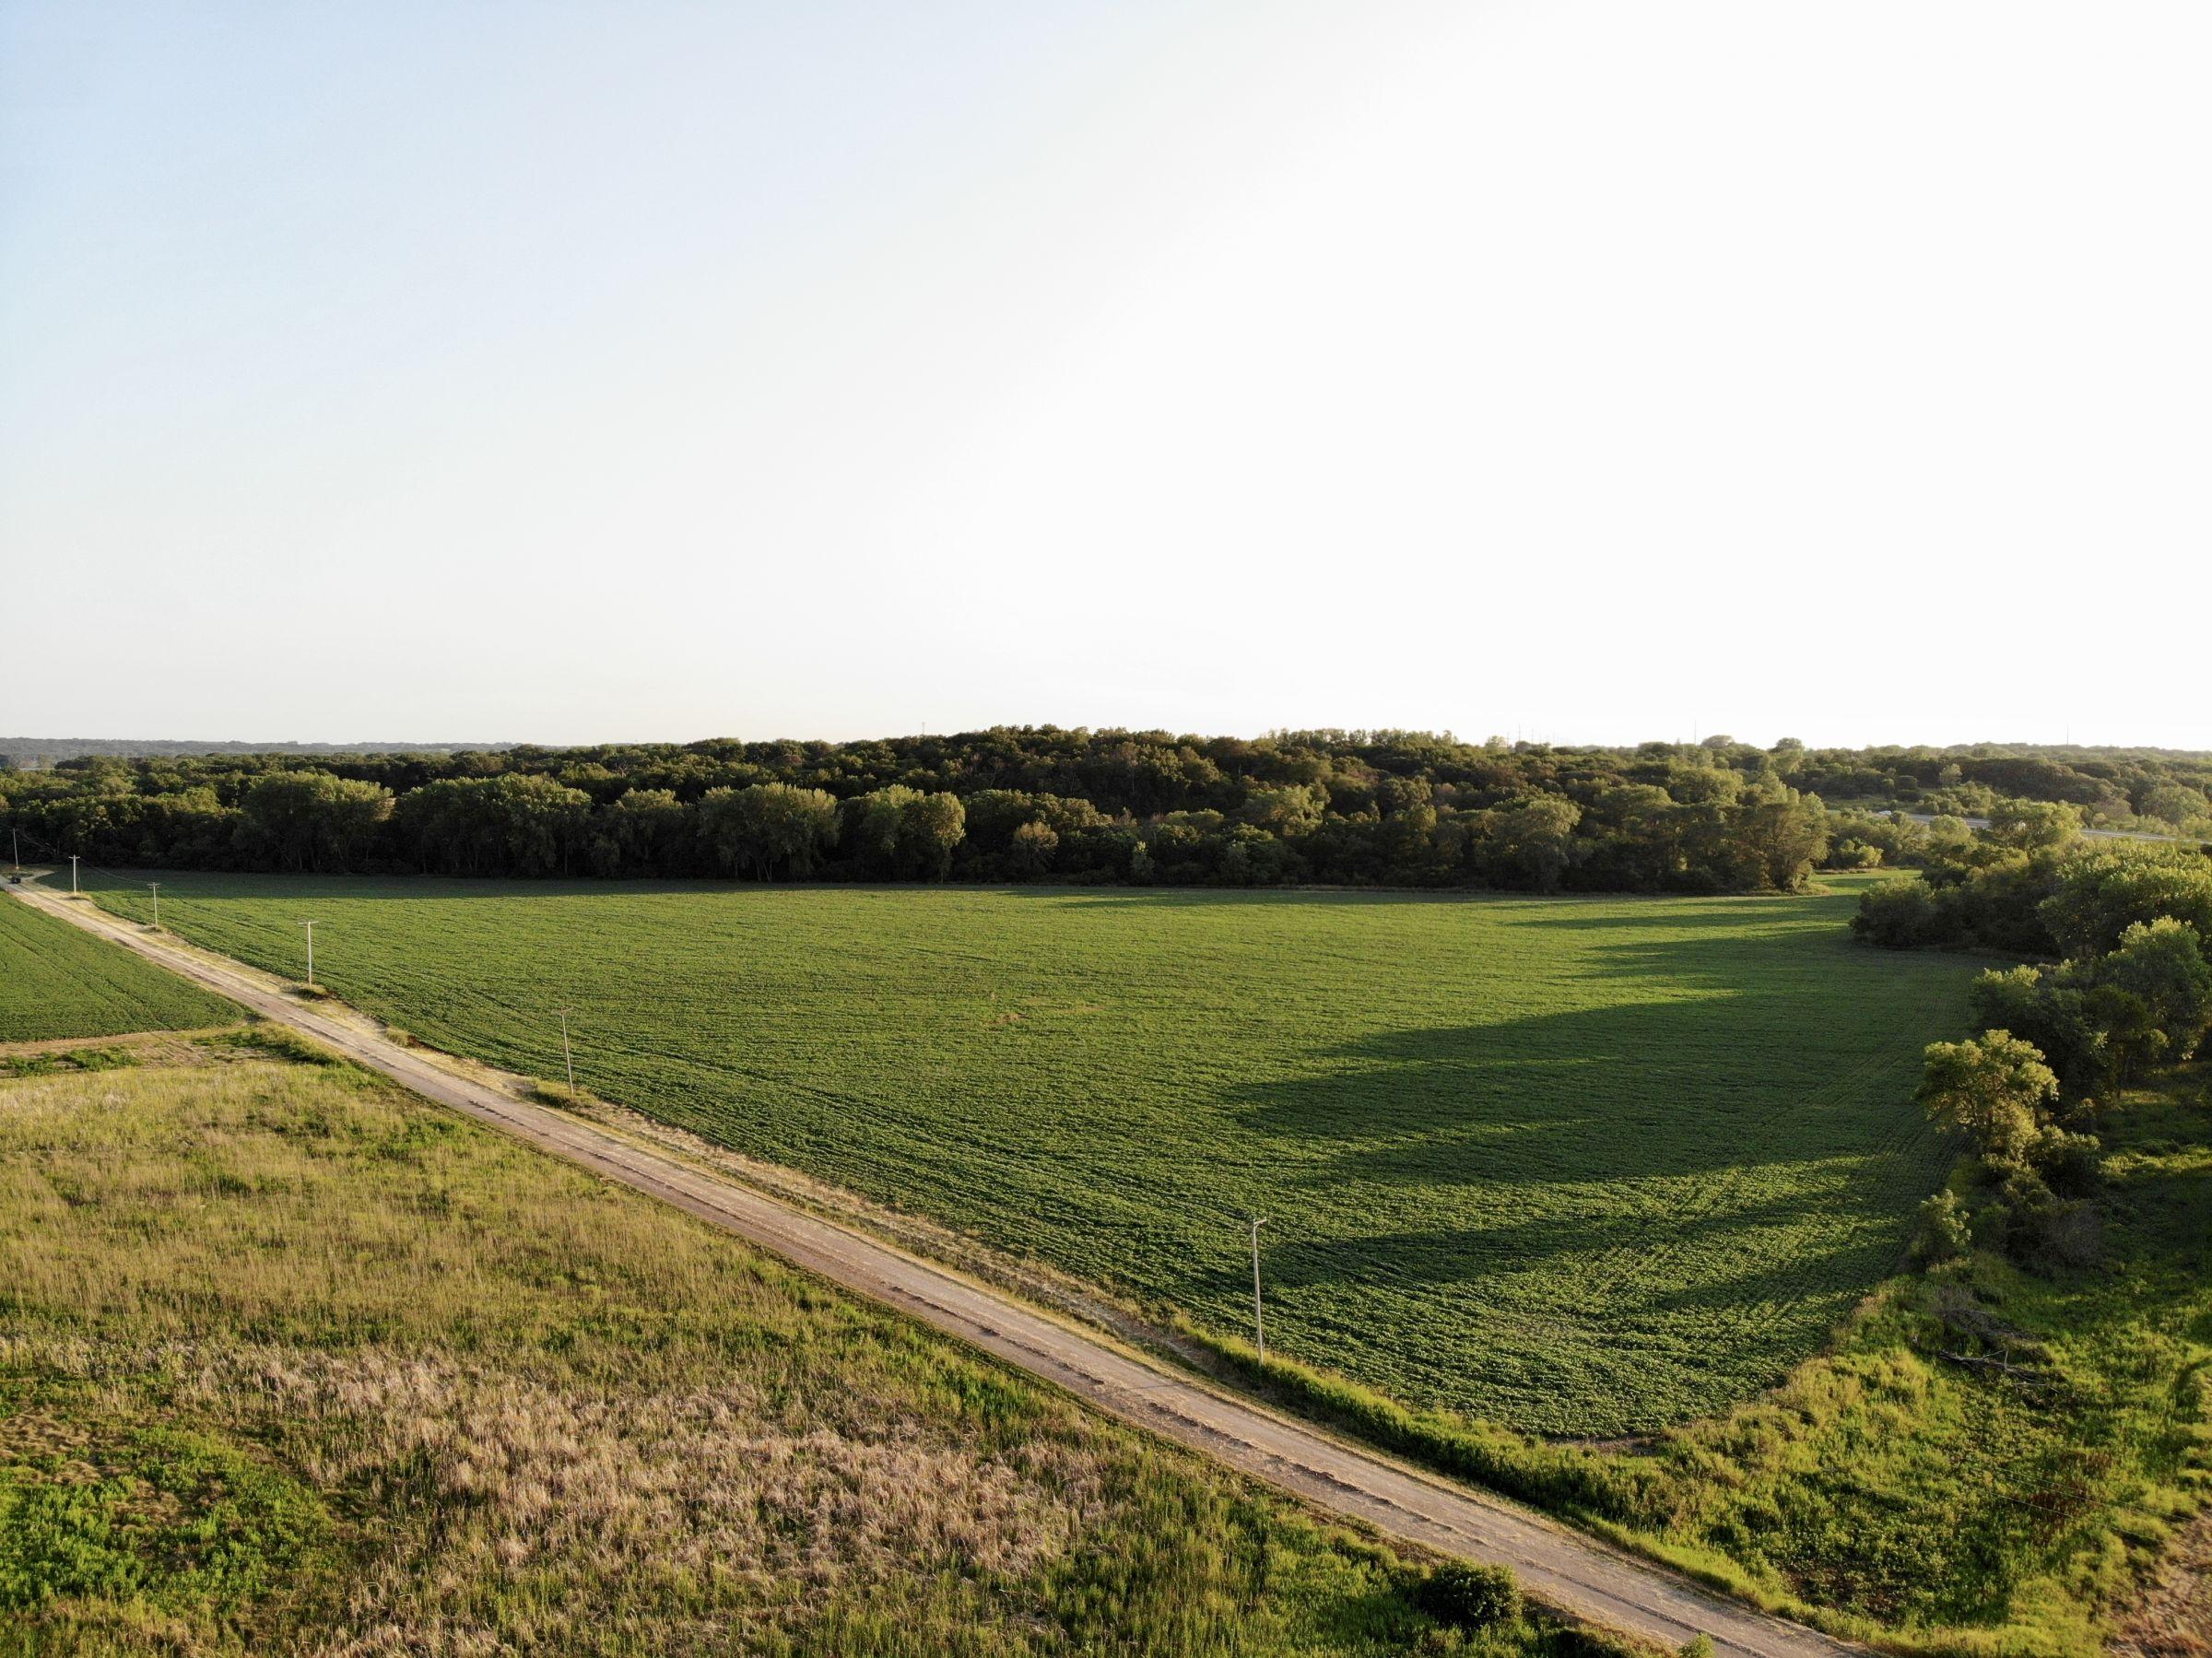 land-polk-county-iowa-89-acres-listing-number-15626-4-2021-07-09-142613.jpg